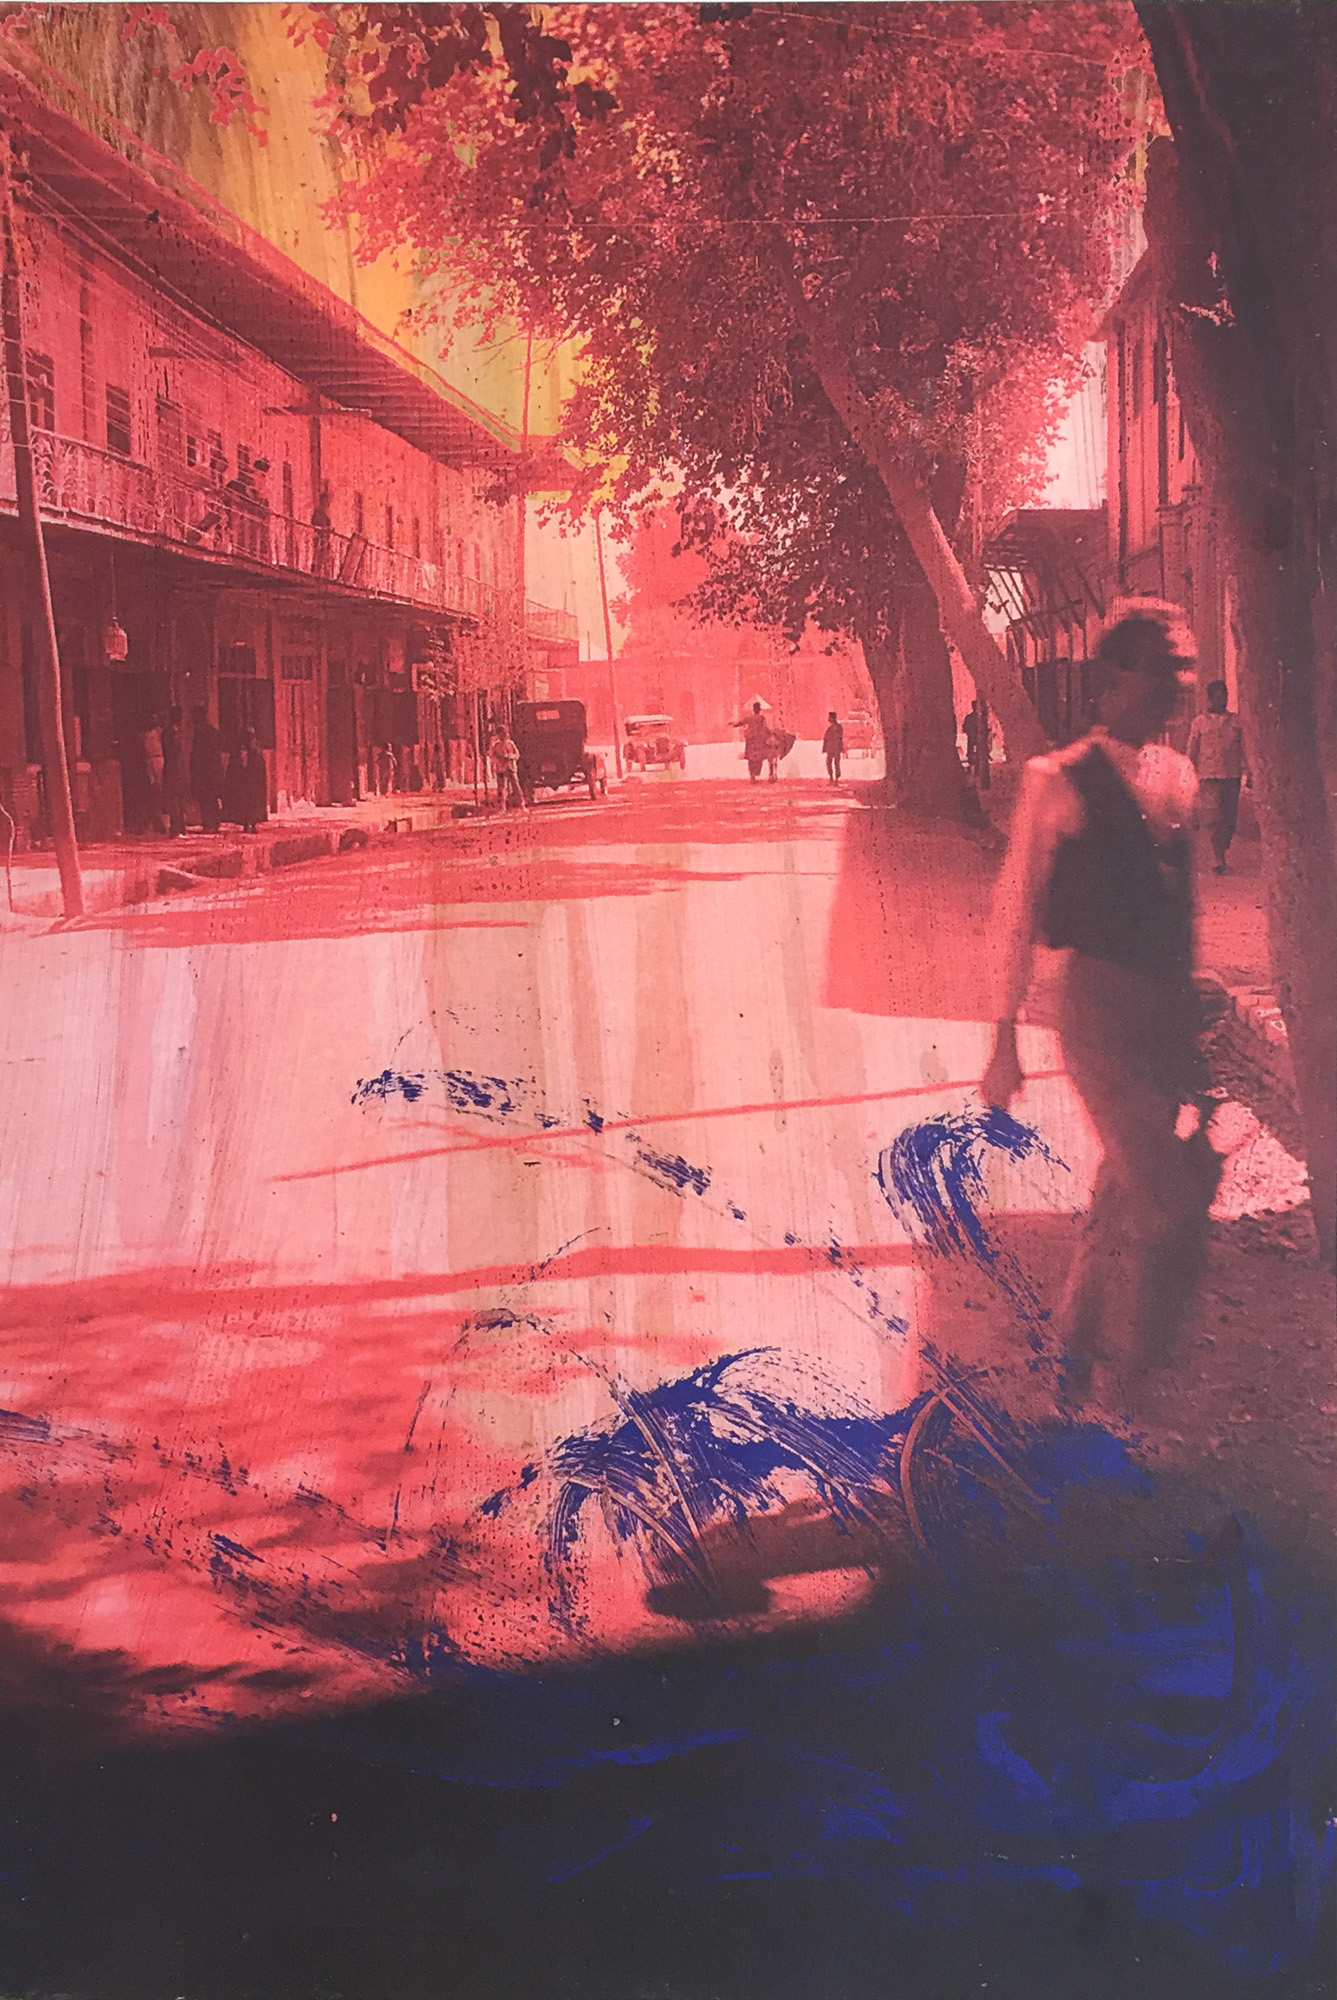 Retroprojection Panneau #4, edic 12, 2016, impresión sobre tela, 150 x 100 cm.